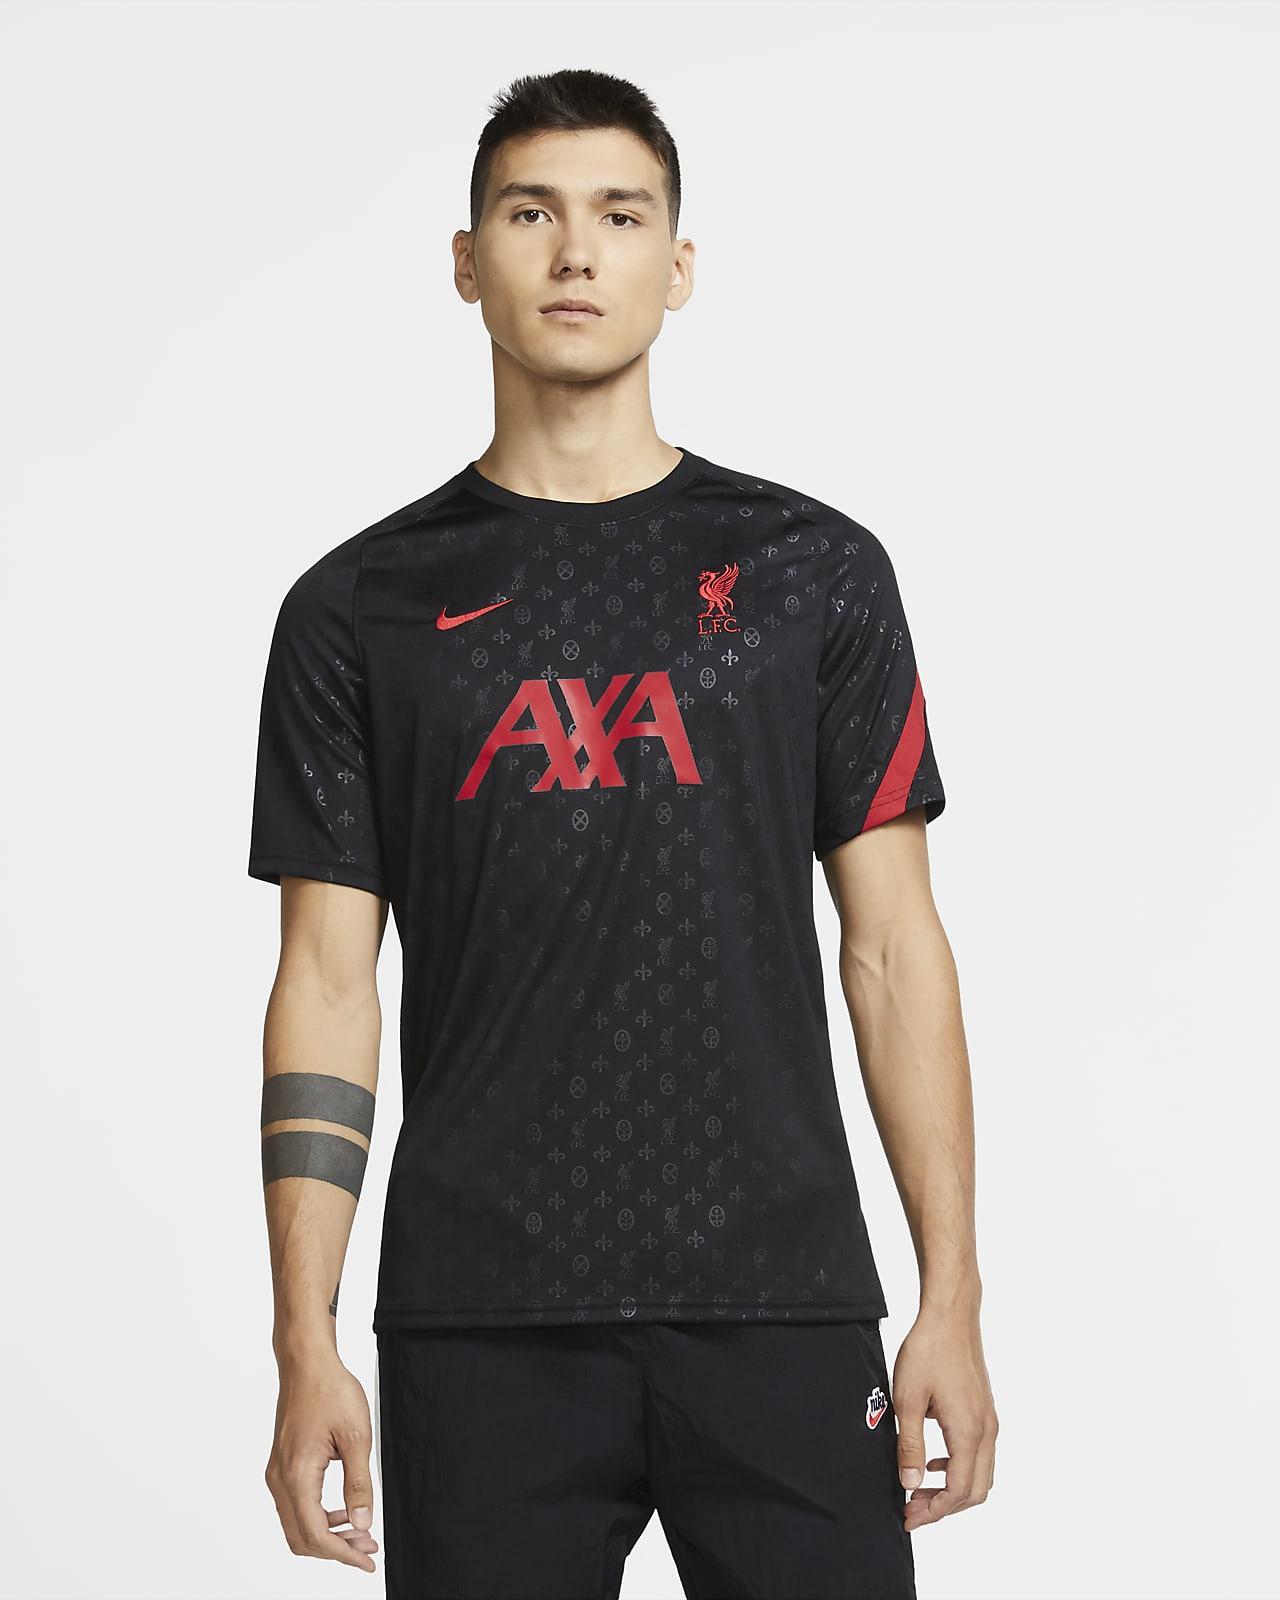 Liverpool FC Camiseta de fútbol de manga corta para antes del partido - Hombre